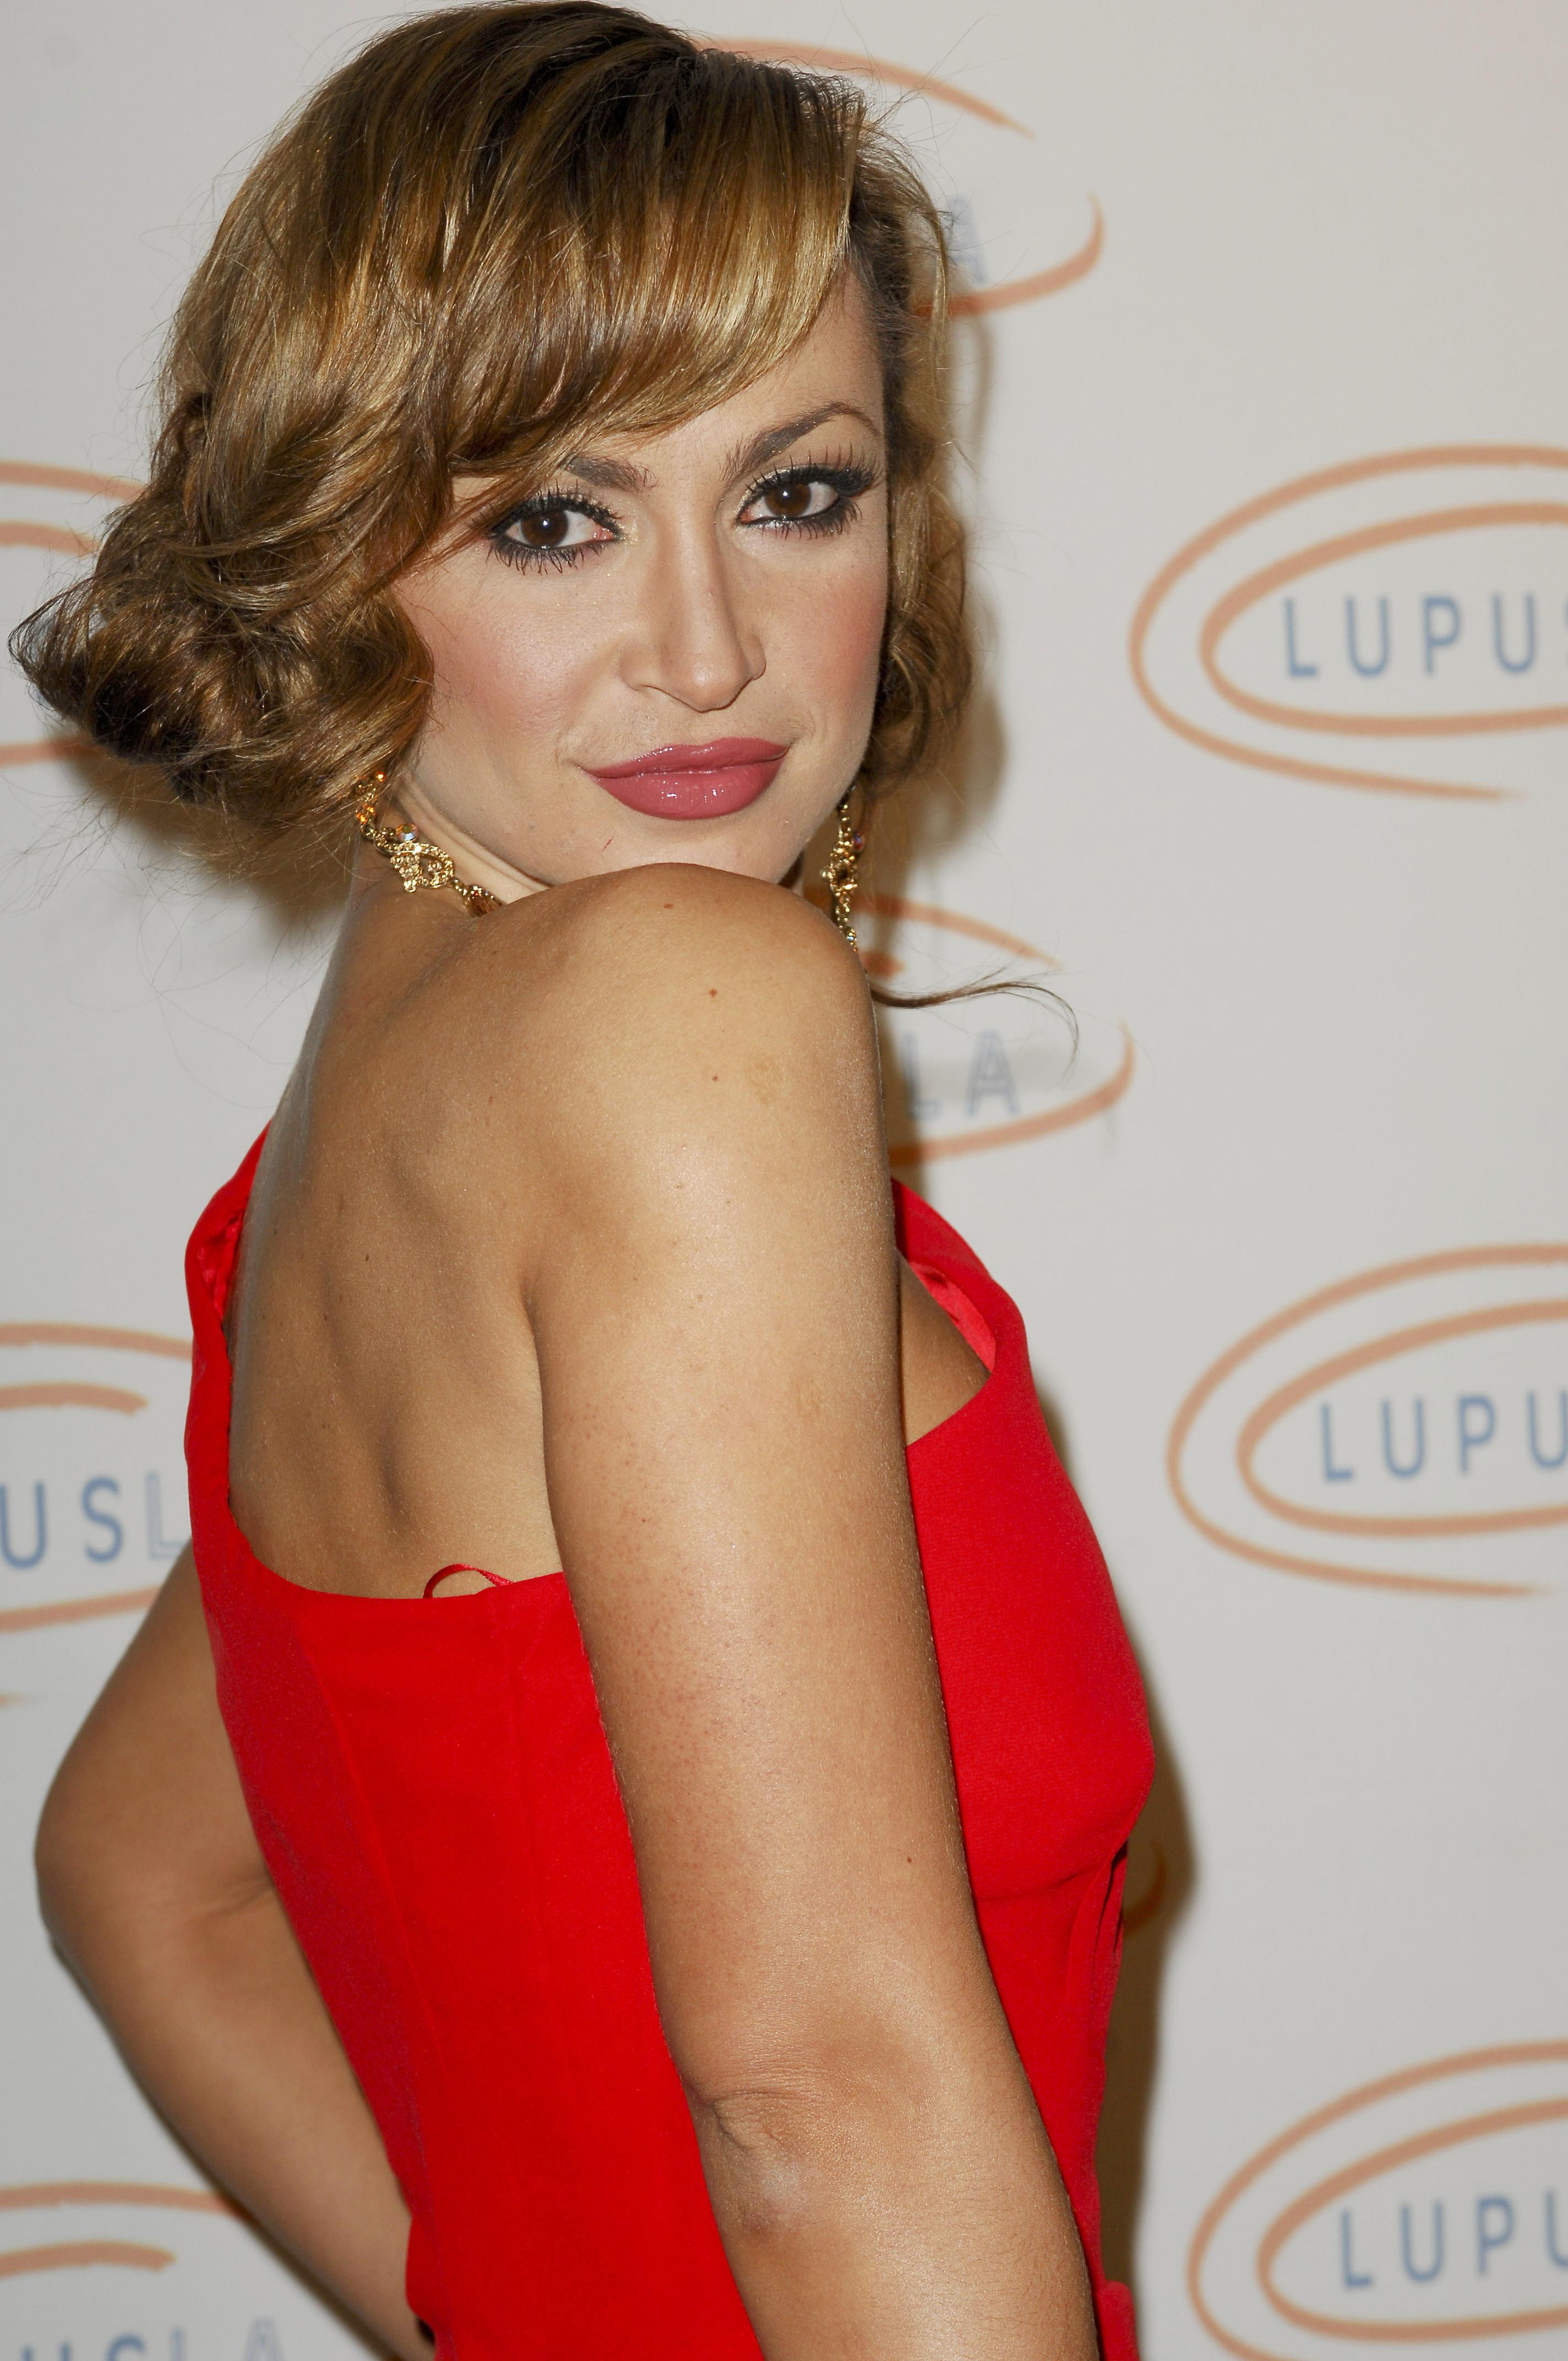 29705_Karina_Smirnoff_2008-11-07_-_Lupus_LA1s_Sixth_Annual_Hollywood_Bag_Ladies_Luncheon_in_Beverly_H_572_122_1190lo.jpg